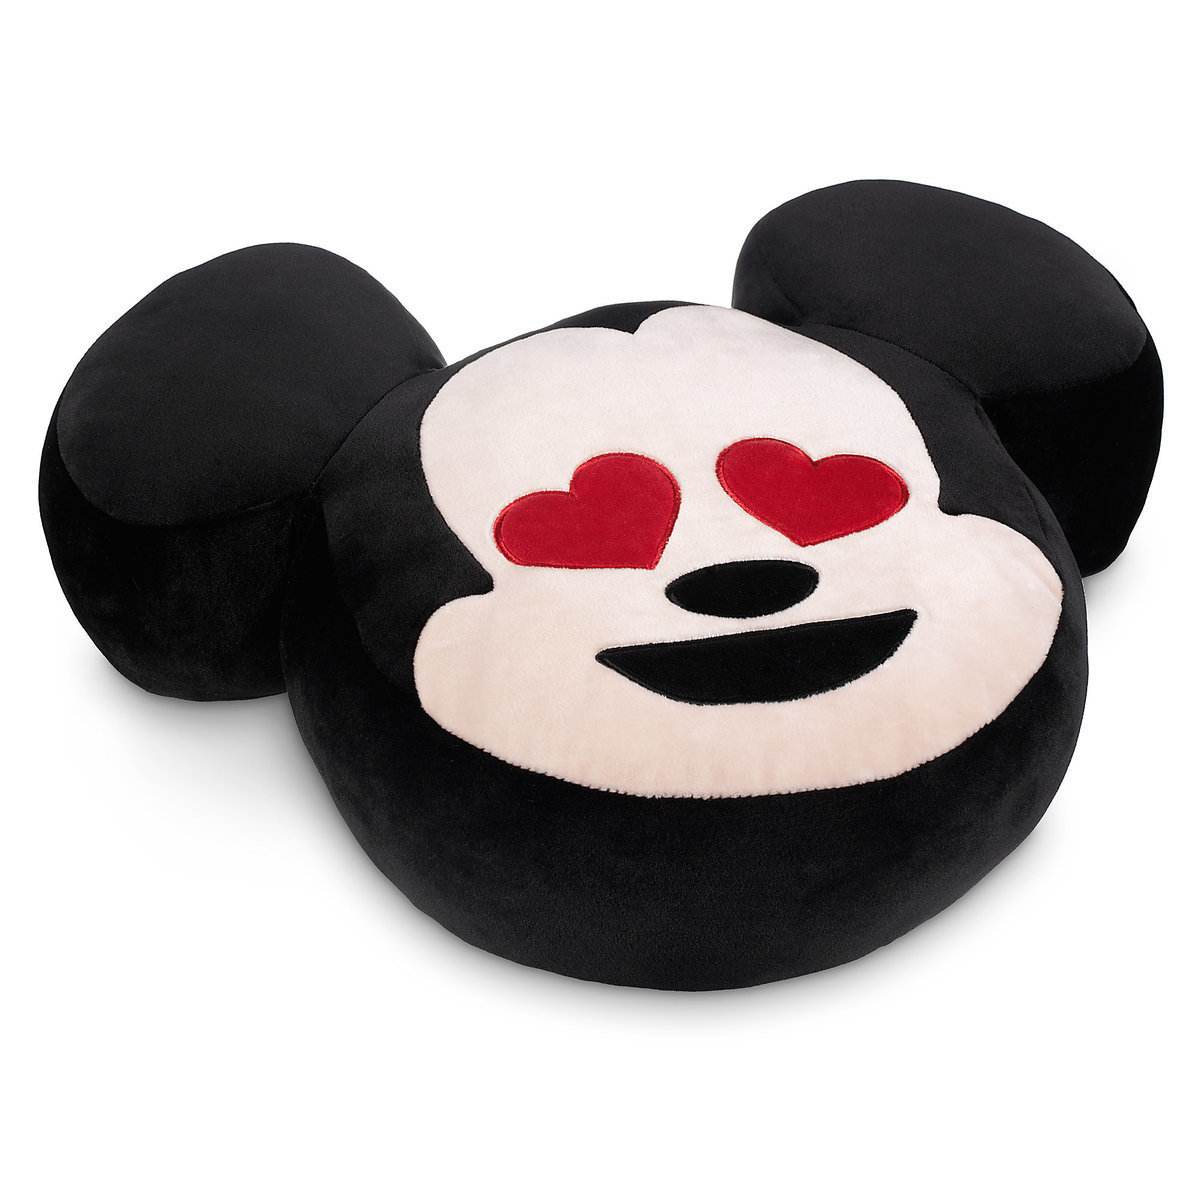 Мягкая подушка «Микки Маус» - Дисней